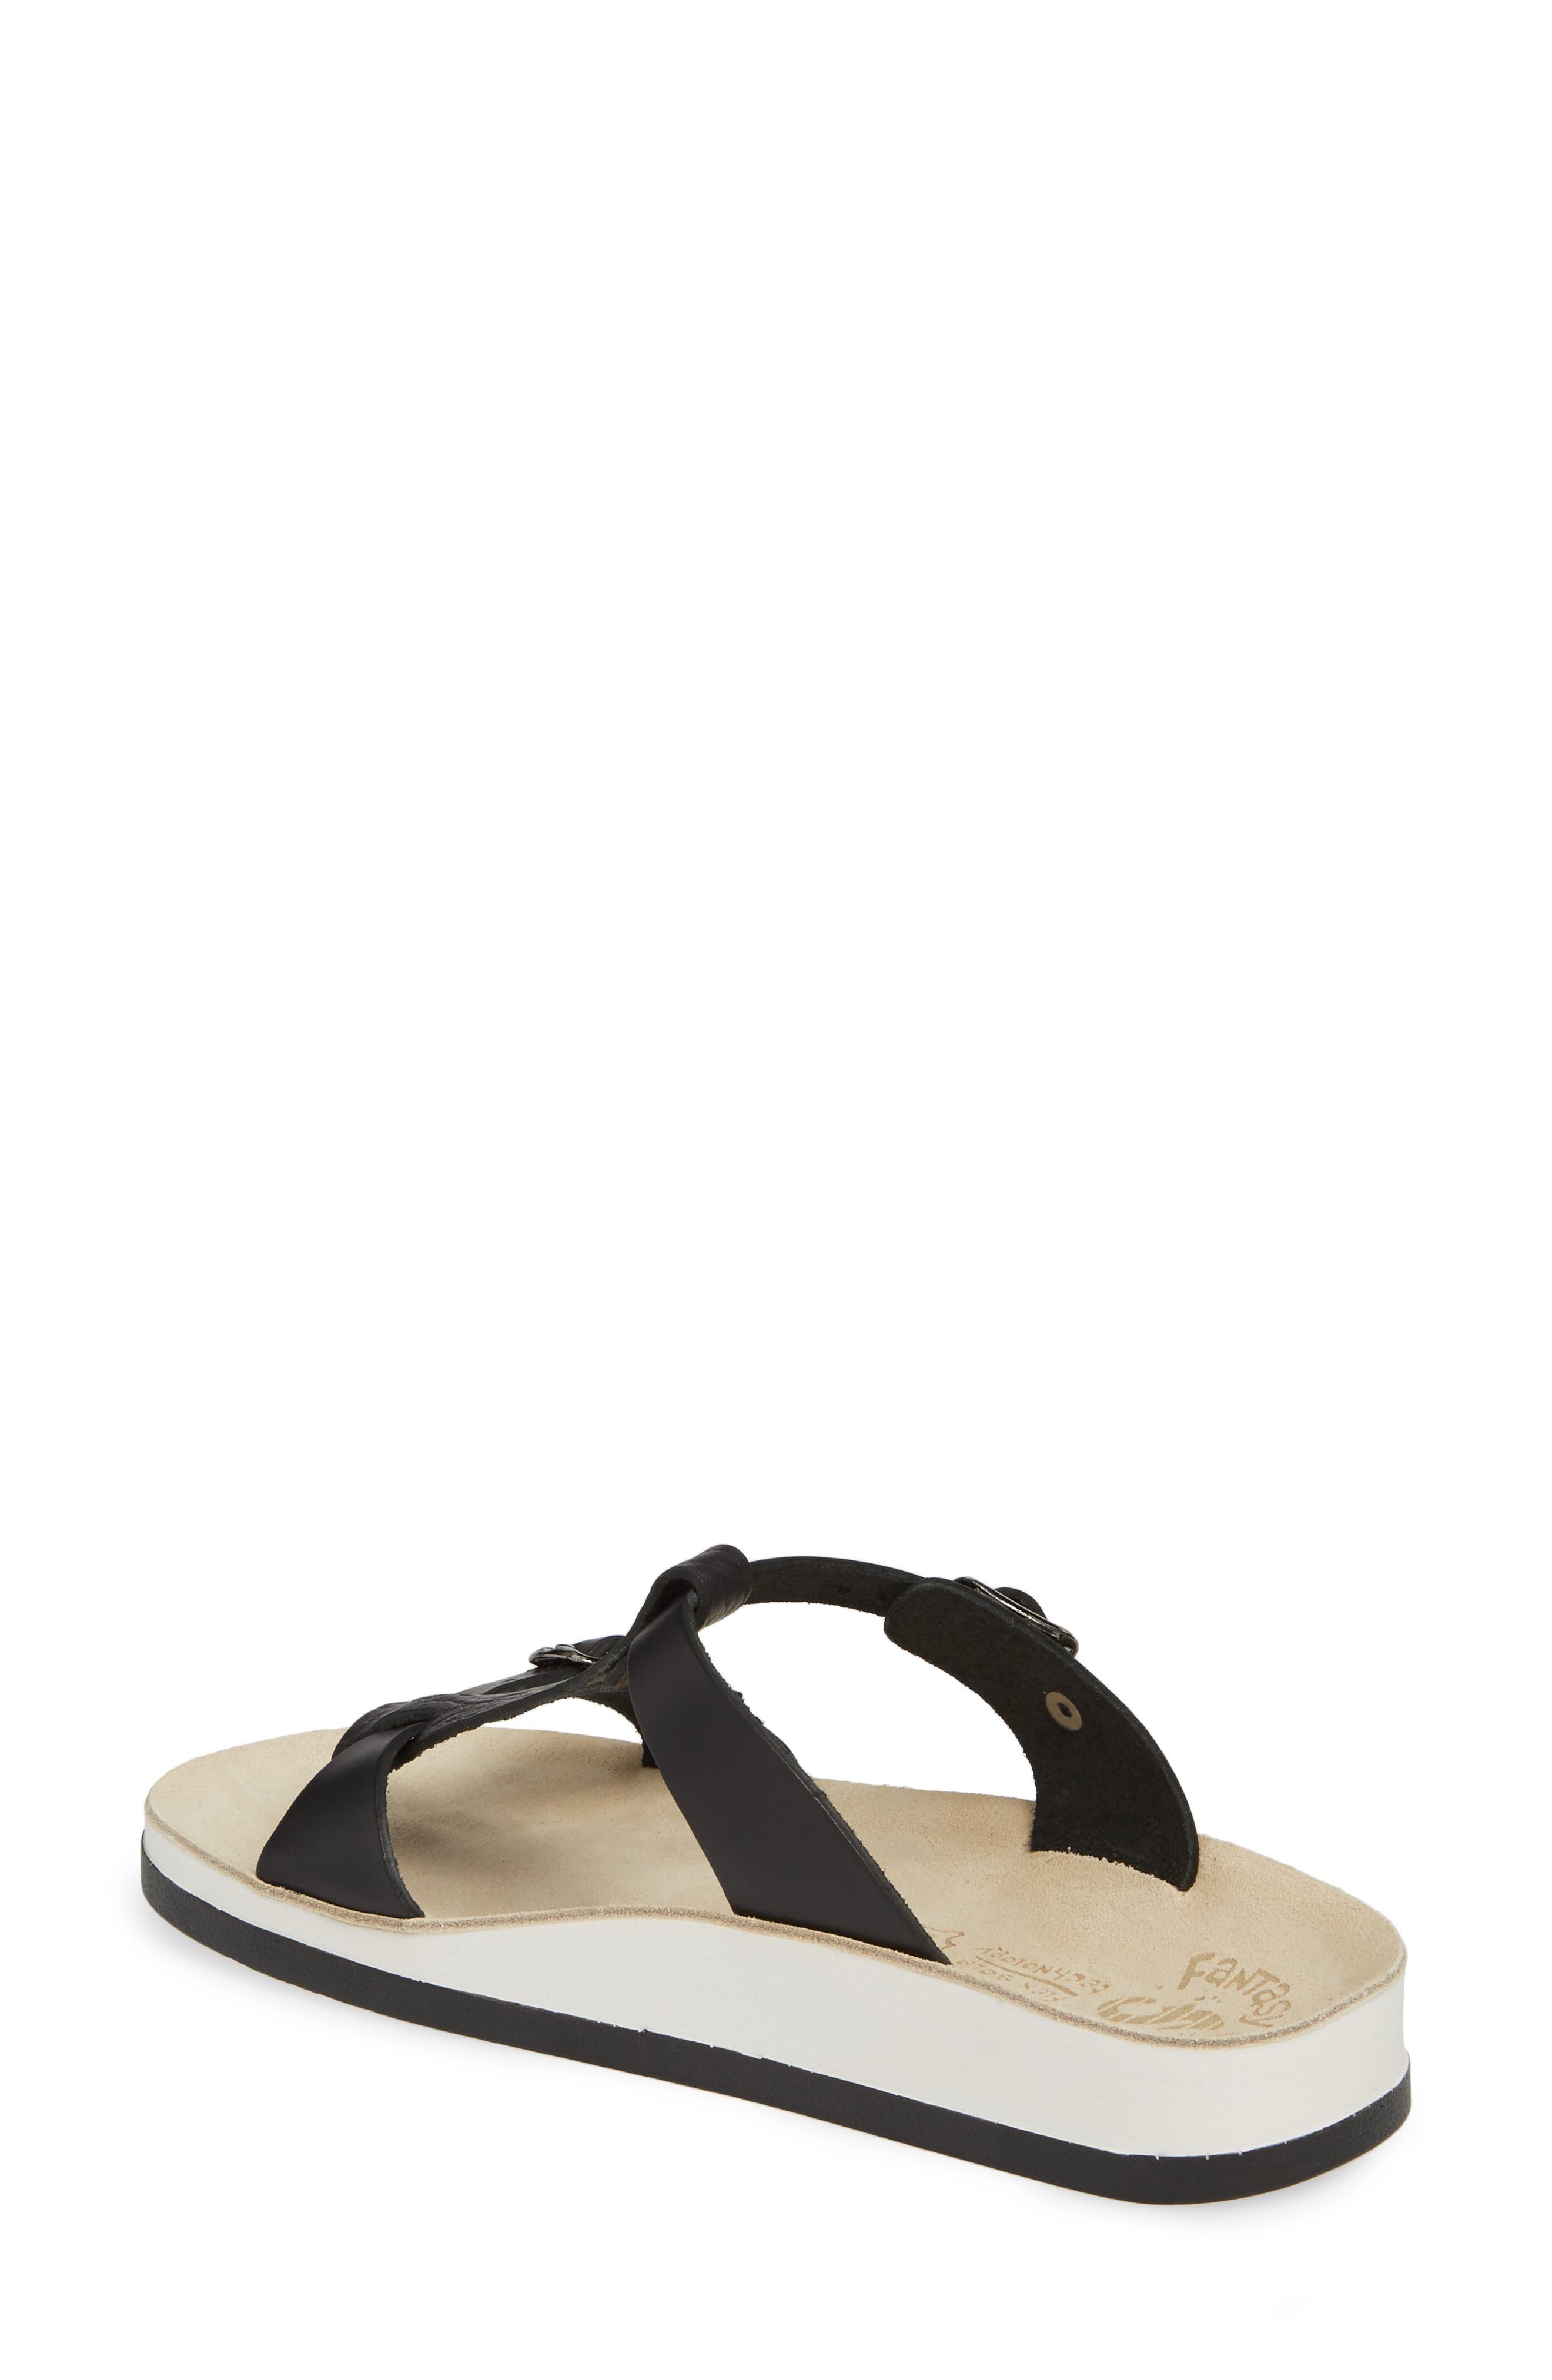 Jessamine T-Strap Sandal,                             Alternate thumbnail 2, color,                             Black Volcano Leather